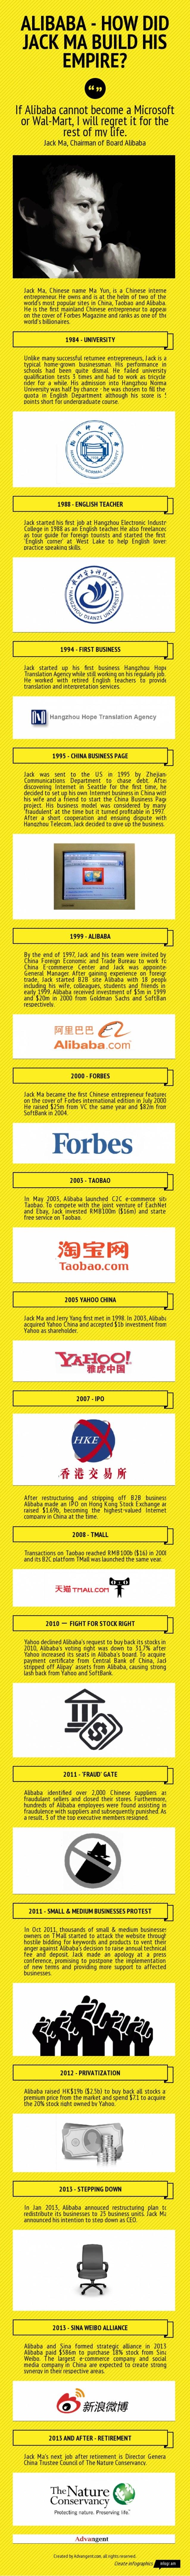 Alibaba - How did jack ma build his empire?